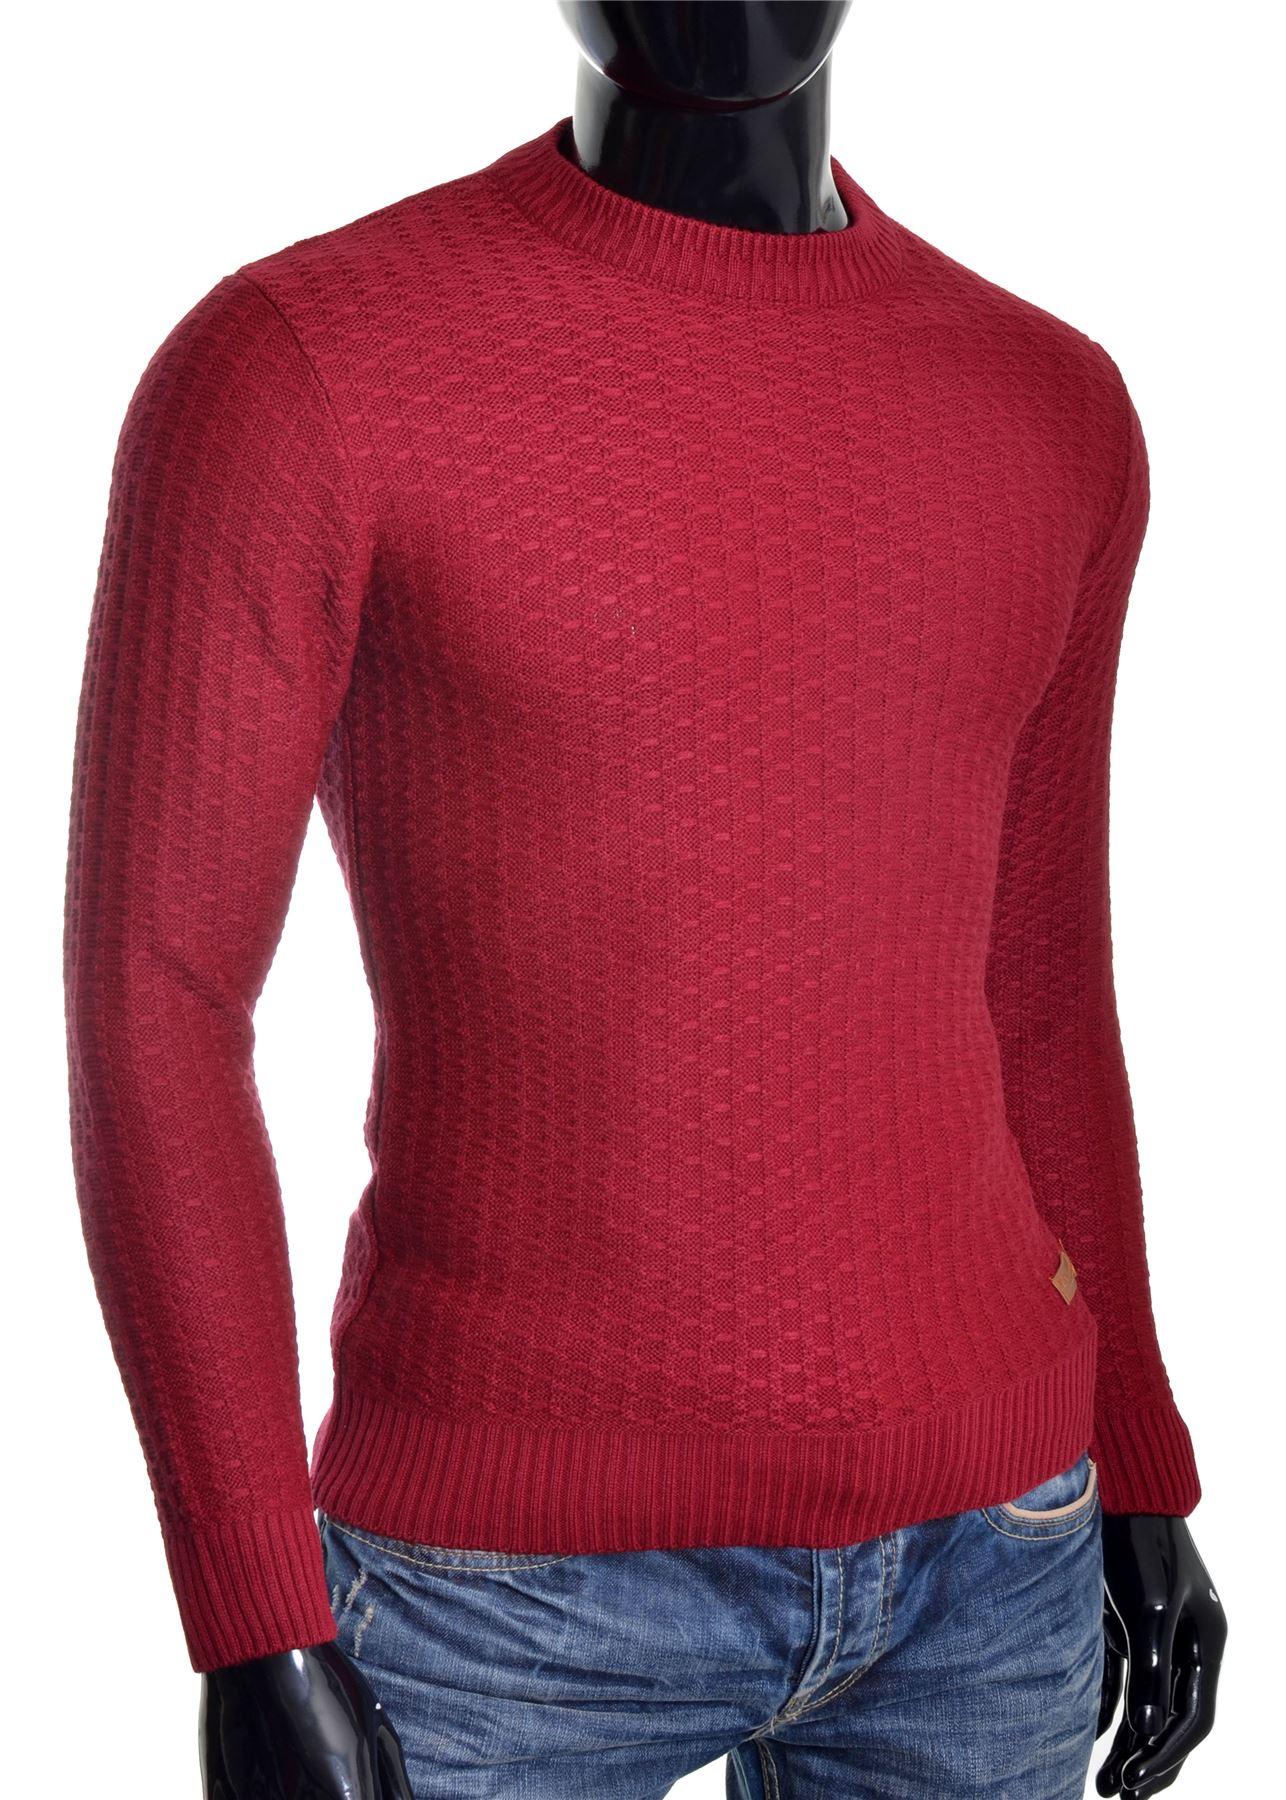 D-amp-R-Men-039-s-Wool-Knit-Jumper-Smart-Long-Sleeve-Sweater-Crew-Neck-Top thumbnail 14